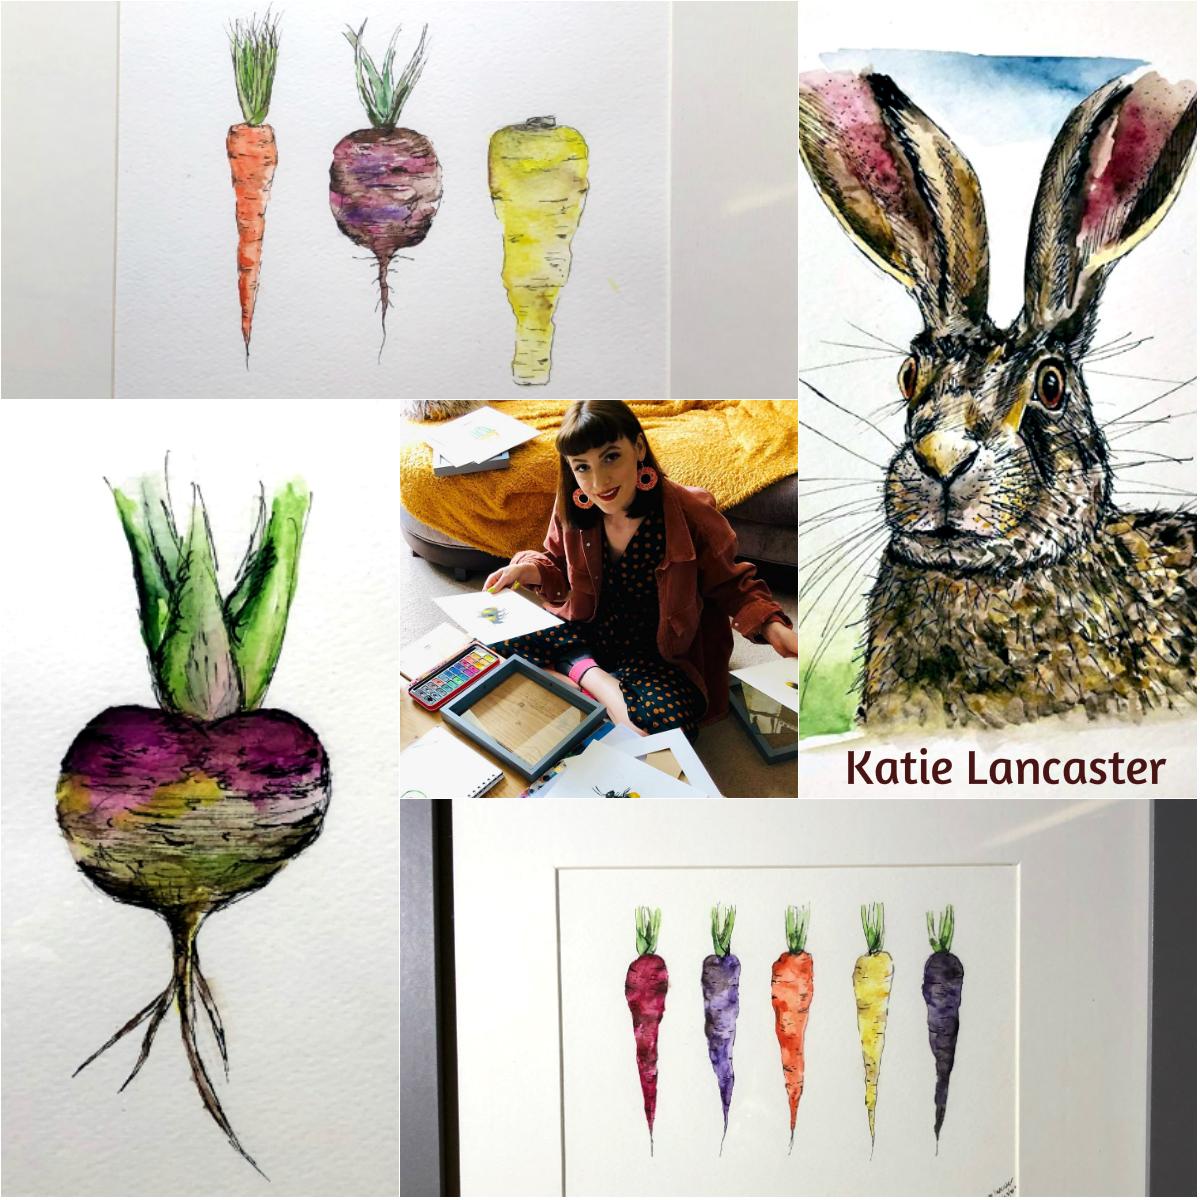 Katie Lancaster - Artist Market at Stamford Arts Centre